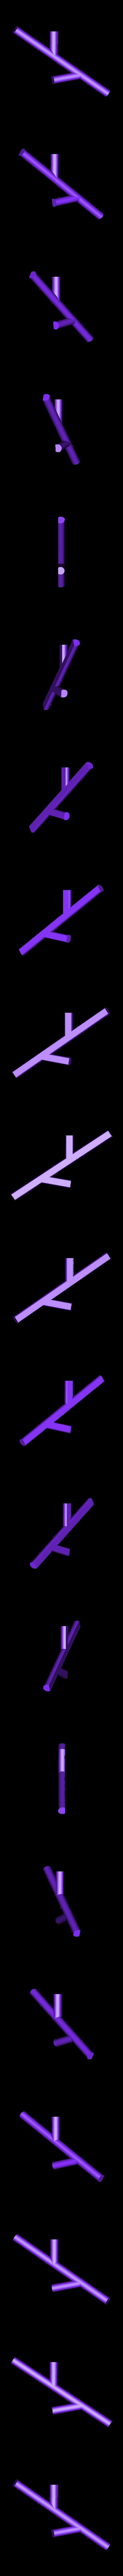 Left_Arm.stl Download free STL file Snowman Ornament • 3D printing design, Desktop_Makes